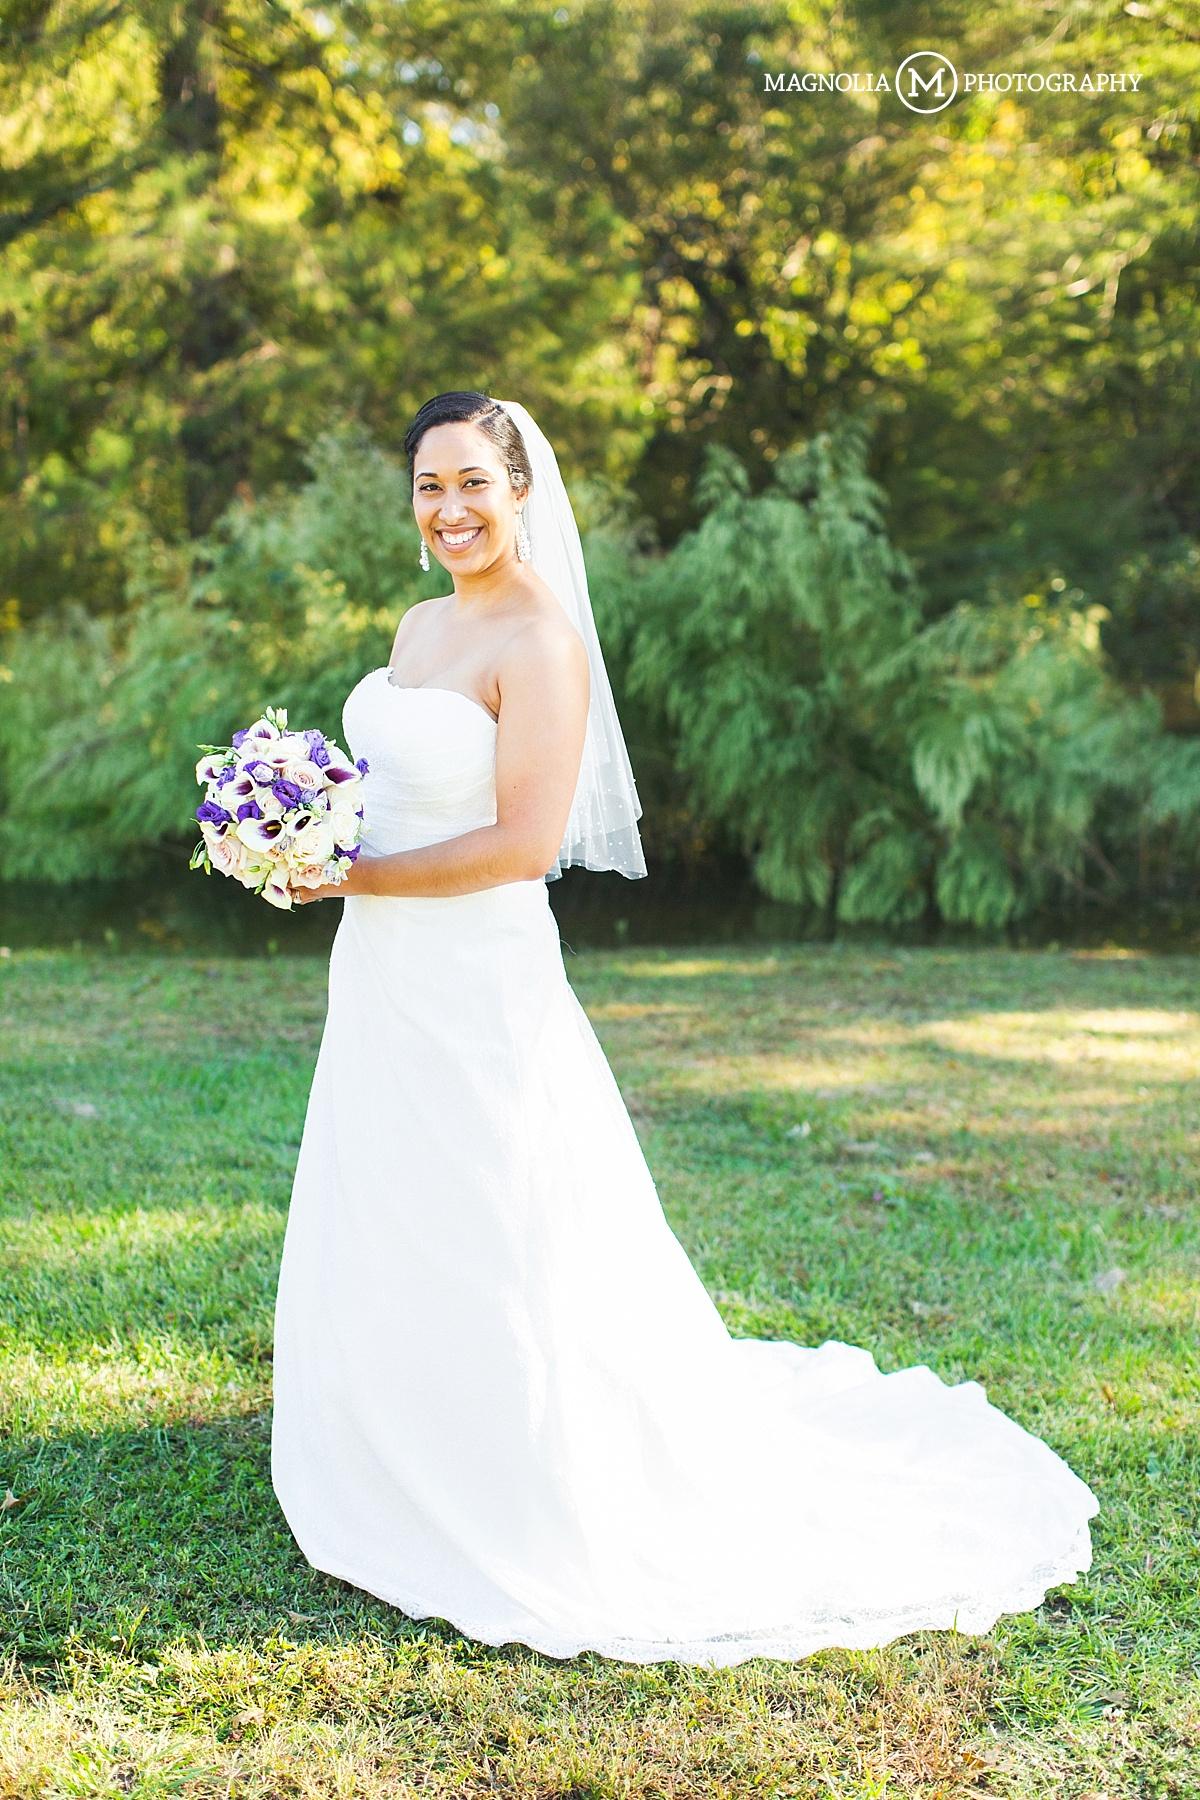 Wedding Dresses Greenville Nc - Wedding Dresses Thumbmediagroup.Com